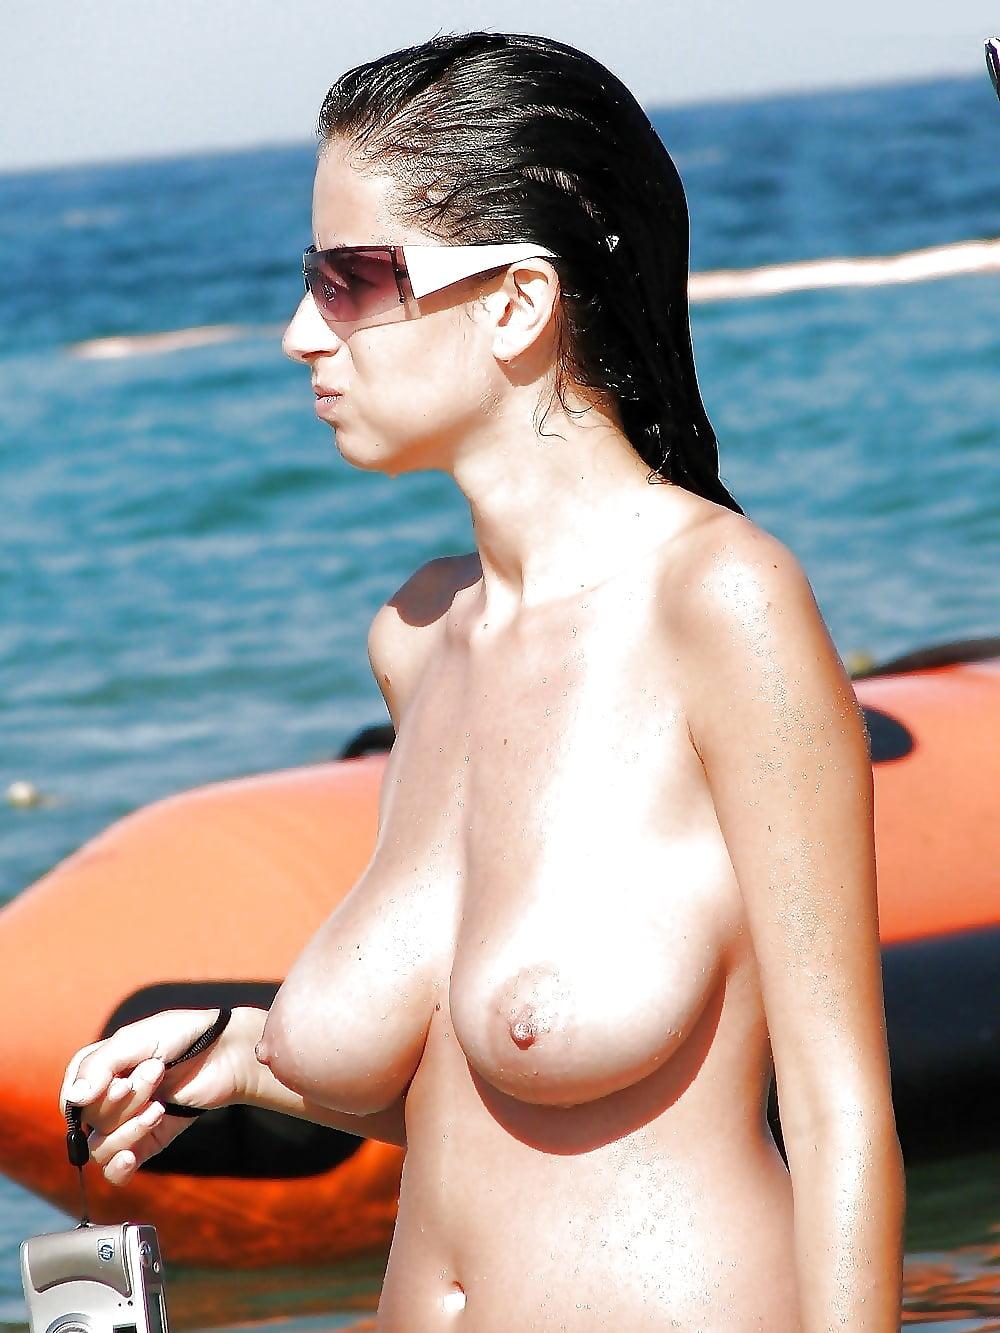 Nude beach female tits, bigboob mexican babes